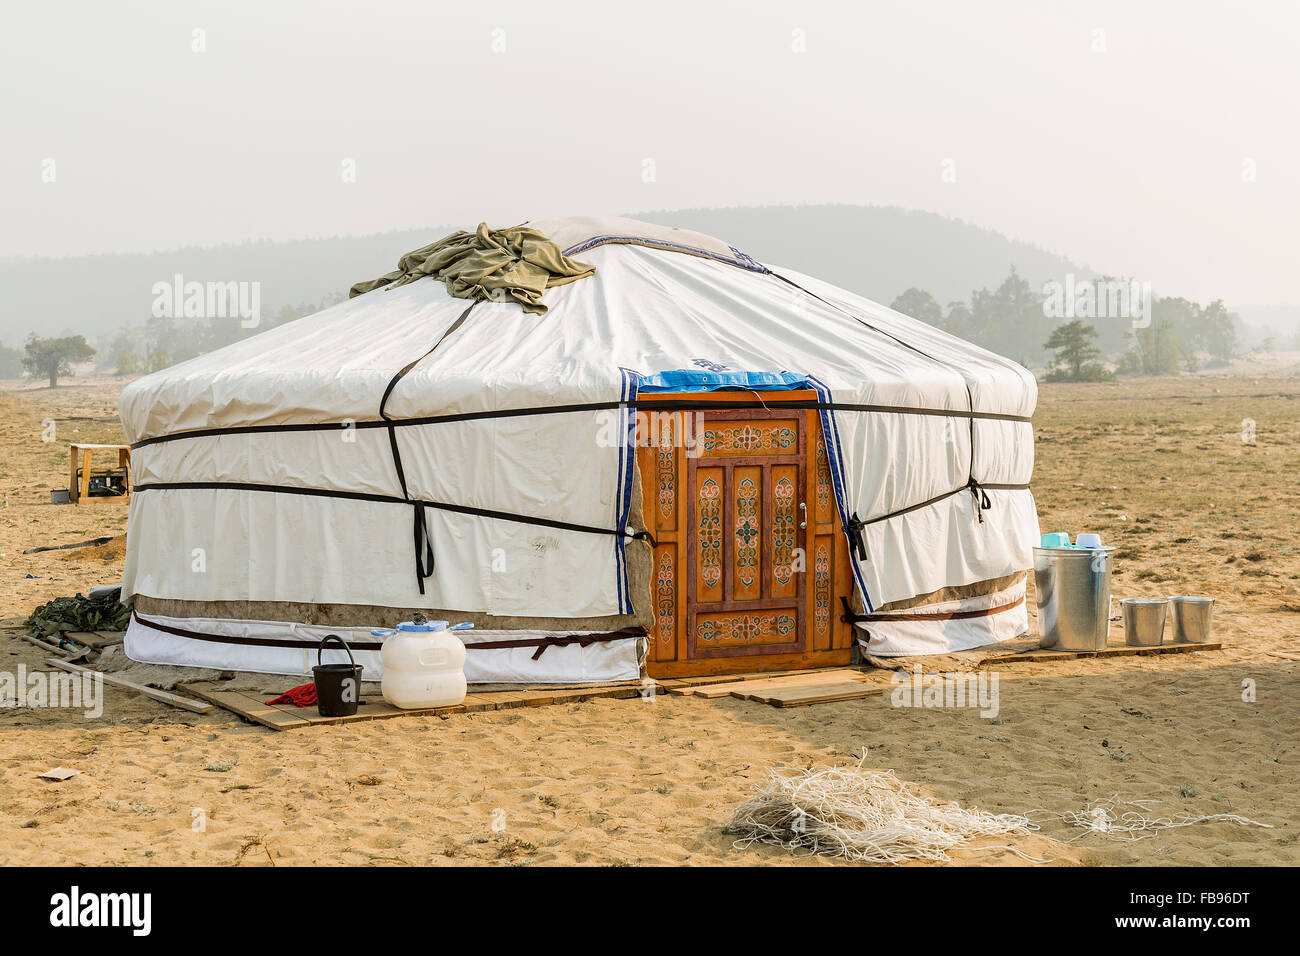 Yurt in a Camp in Olkhon Island - Lake Baikal, Russia - Stock Image